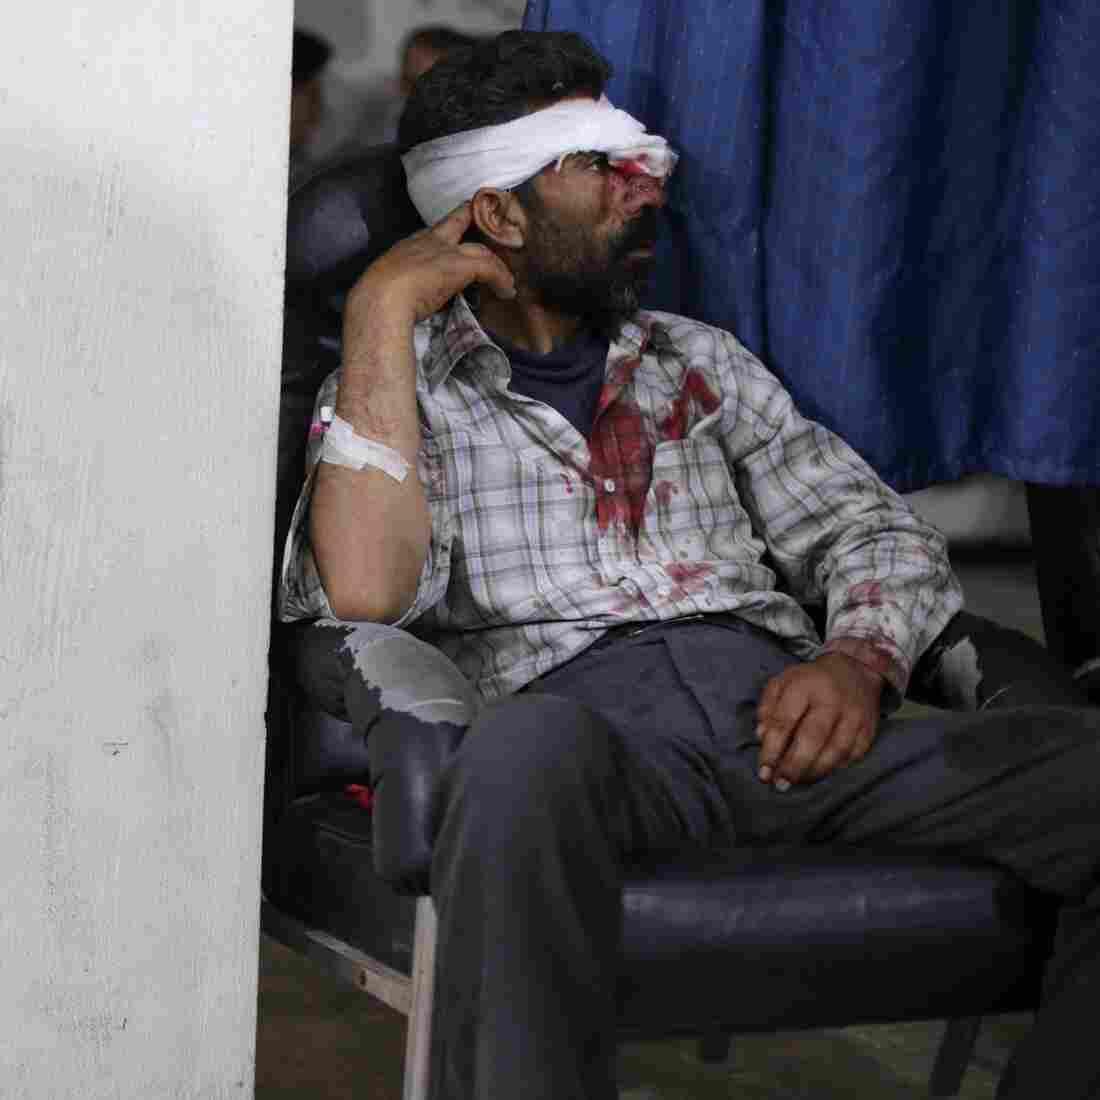 U.N. Says Assad Regime, Islamic State Are Committing War Crimes In Syria